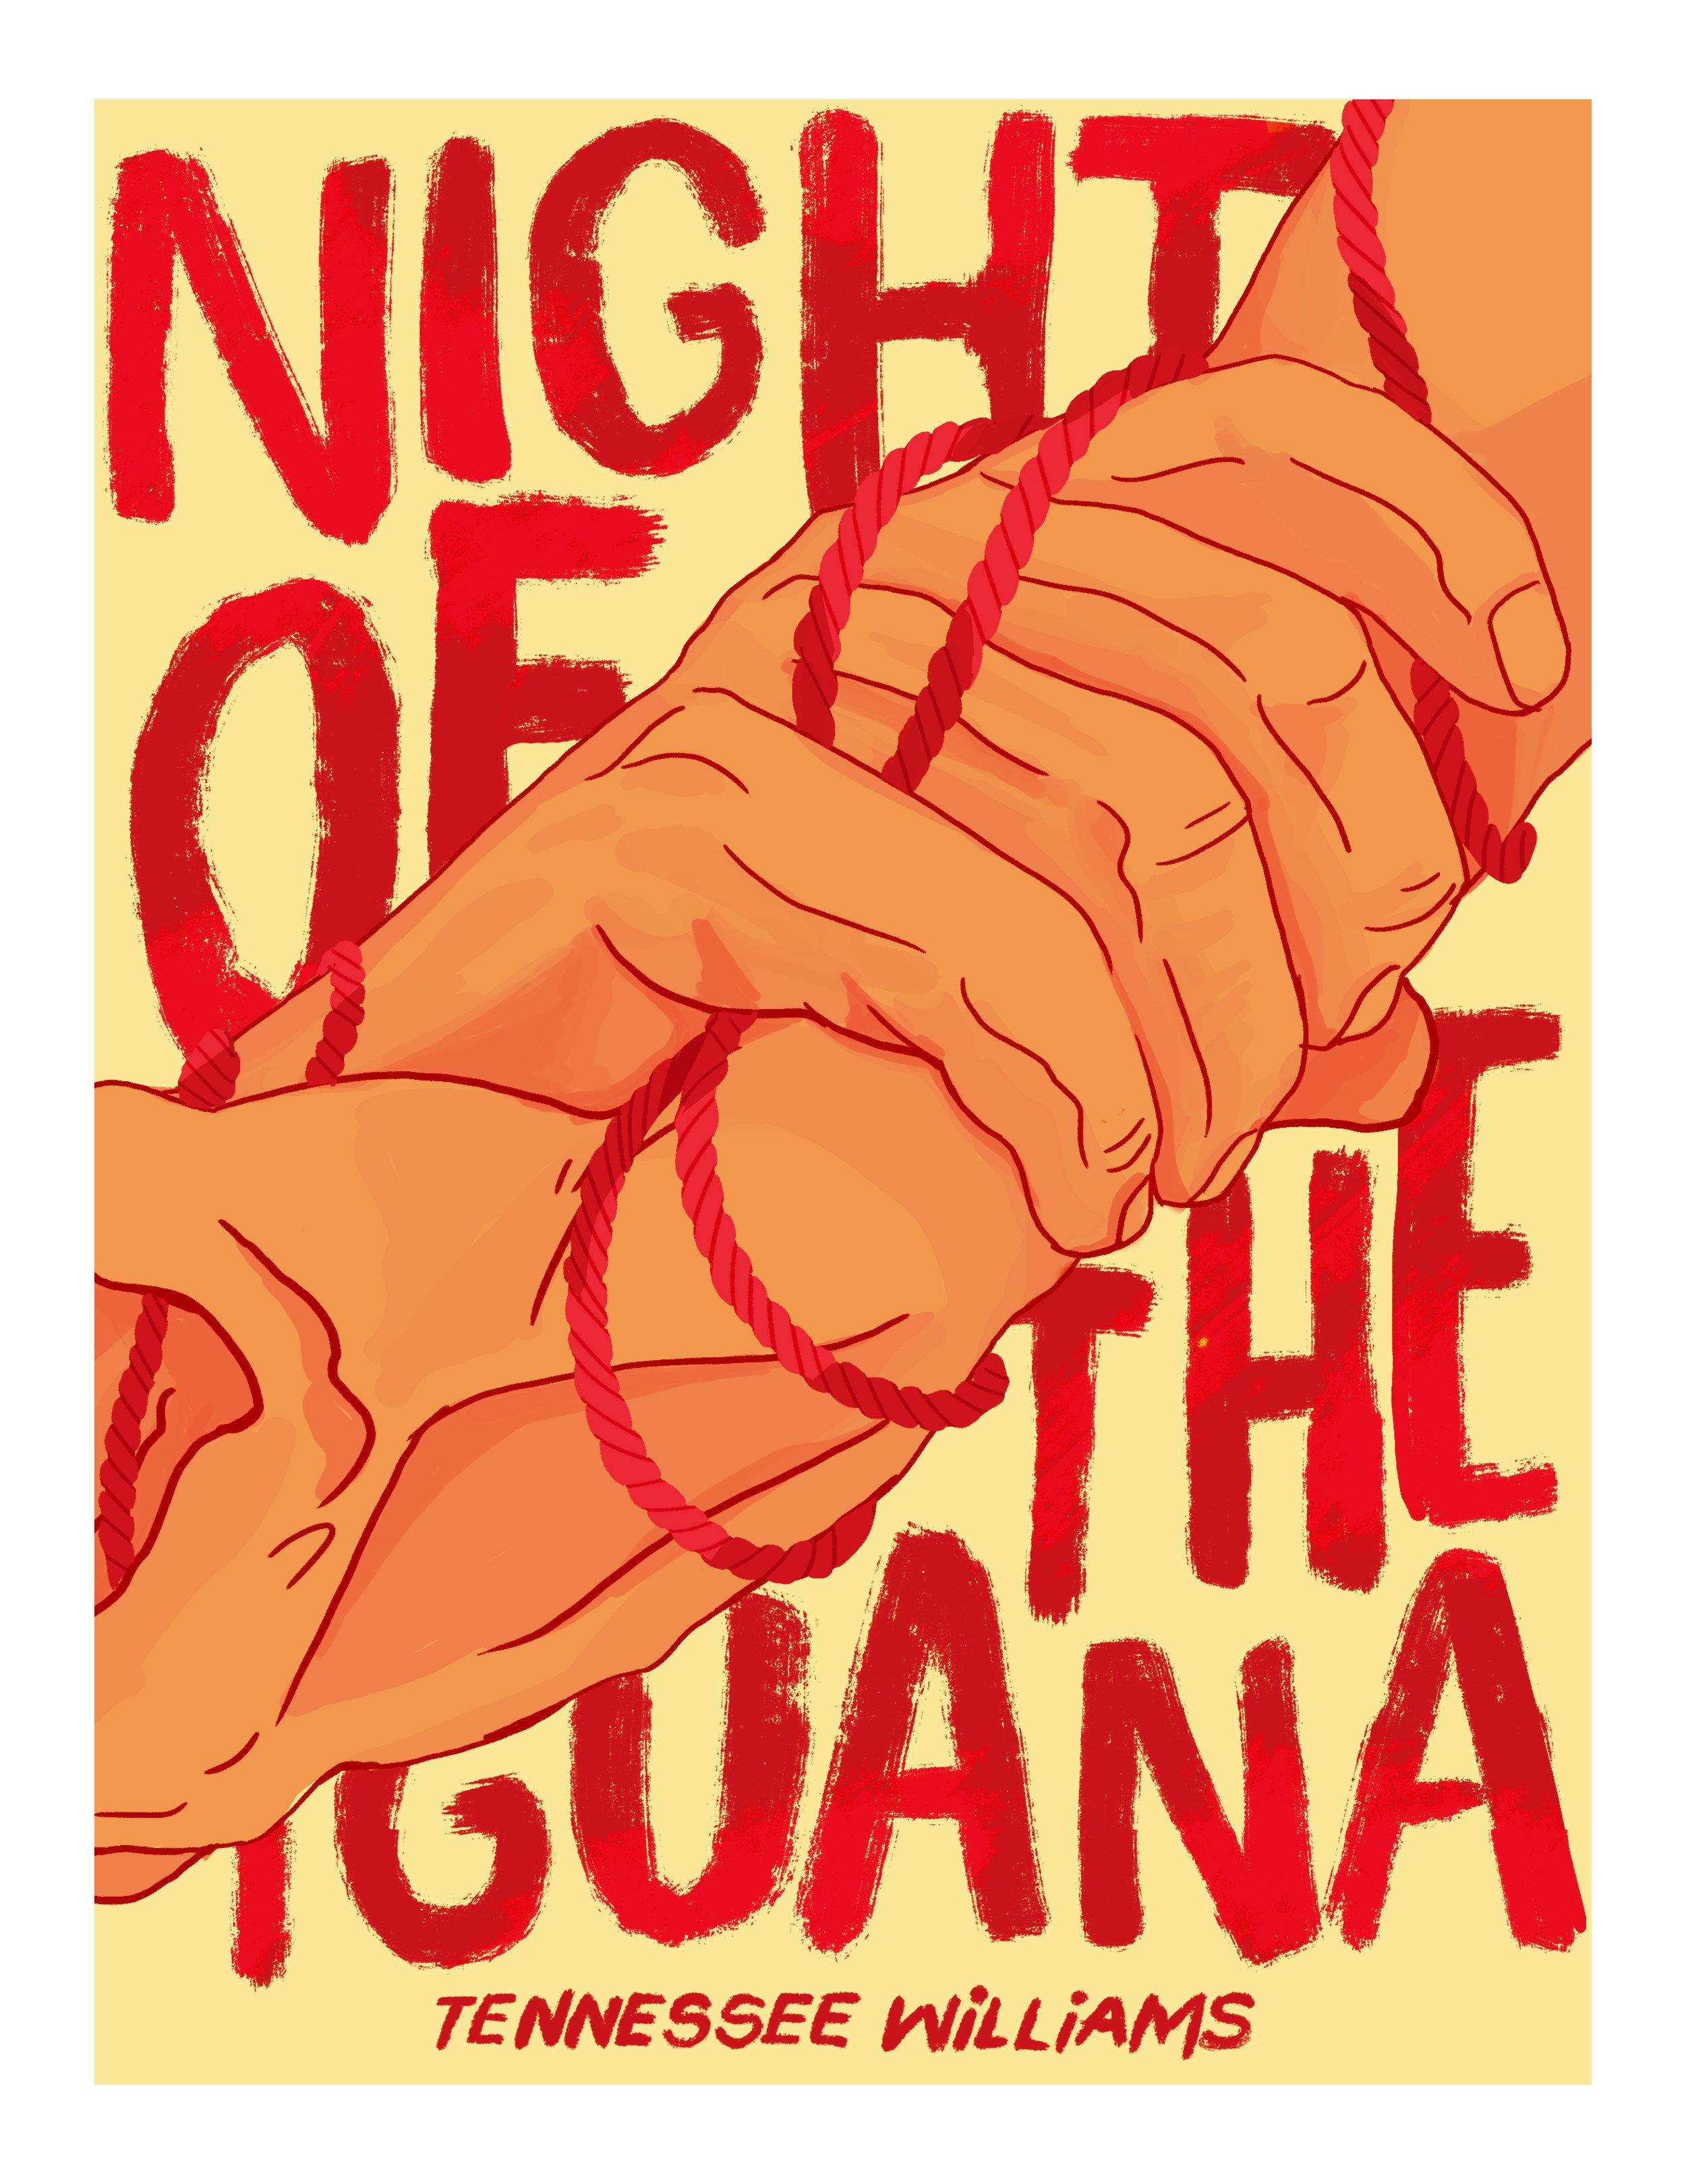 iguanafinal.jpg